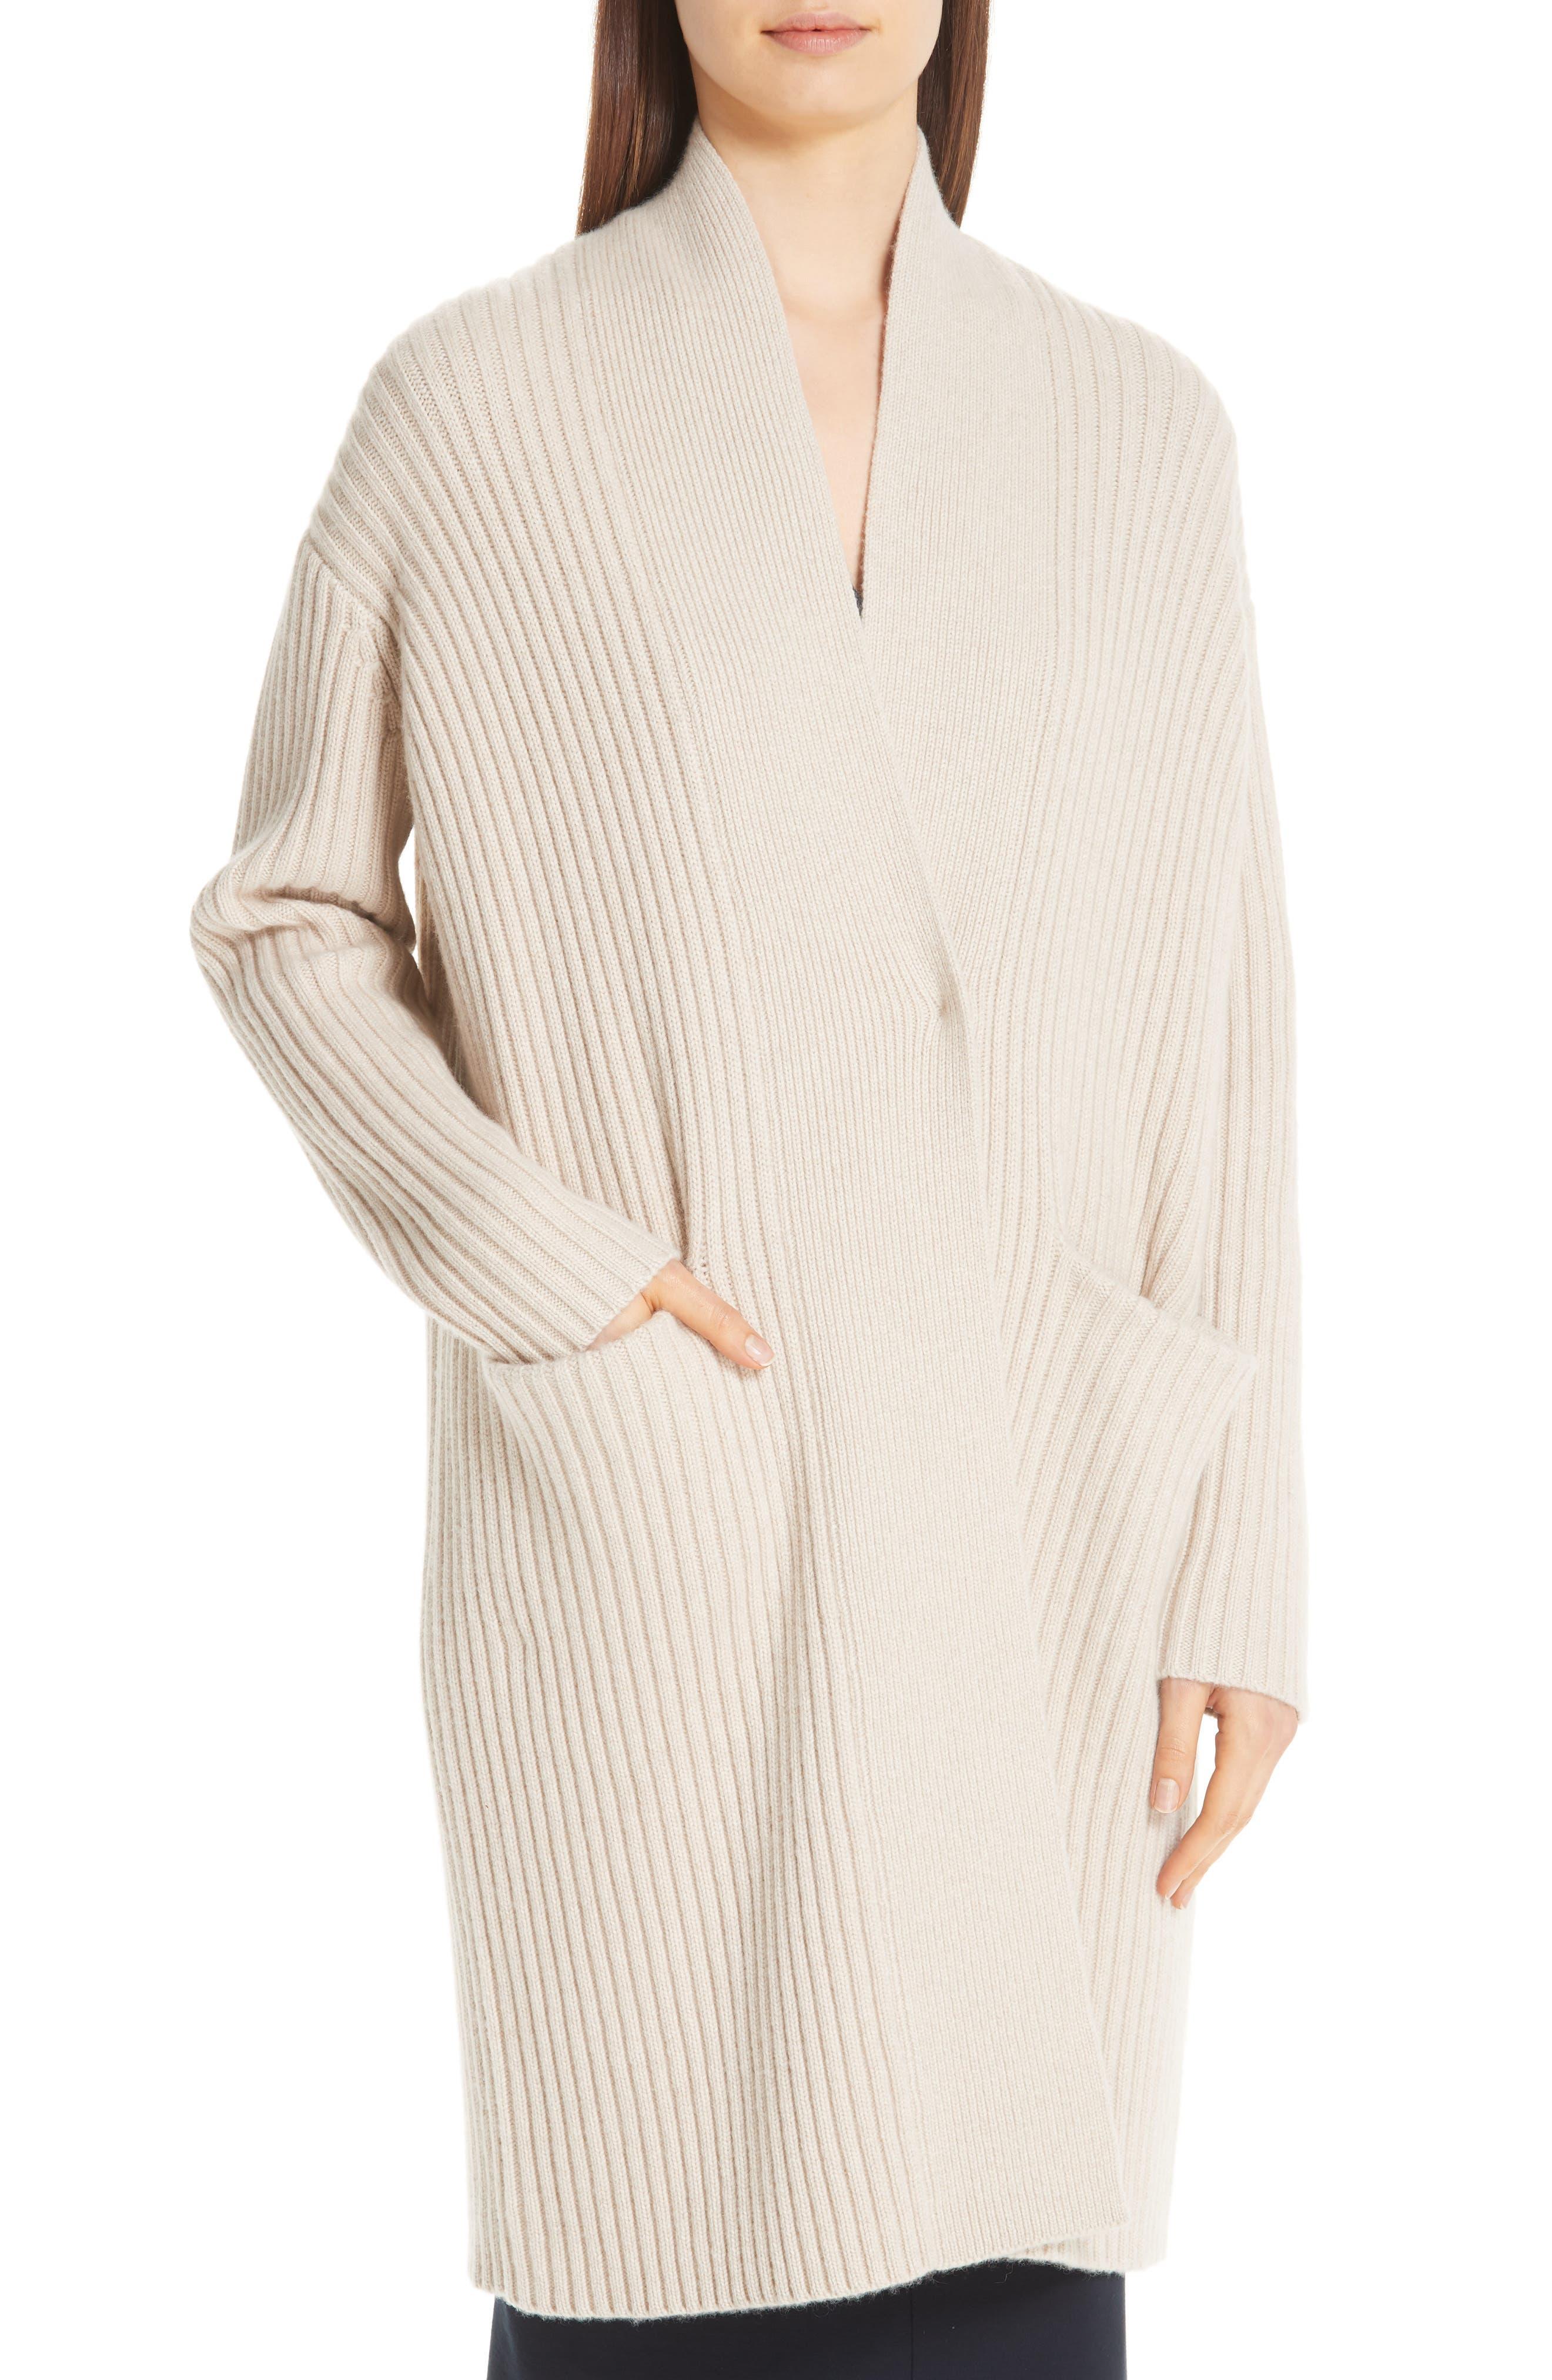 Lia Cashmere & Merino Wool Sweater,                             Alternate thumbnail 4, color,                             SAND